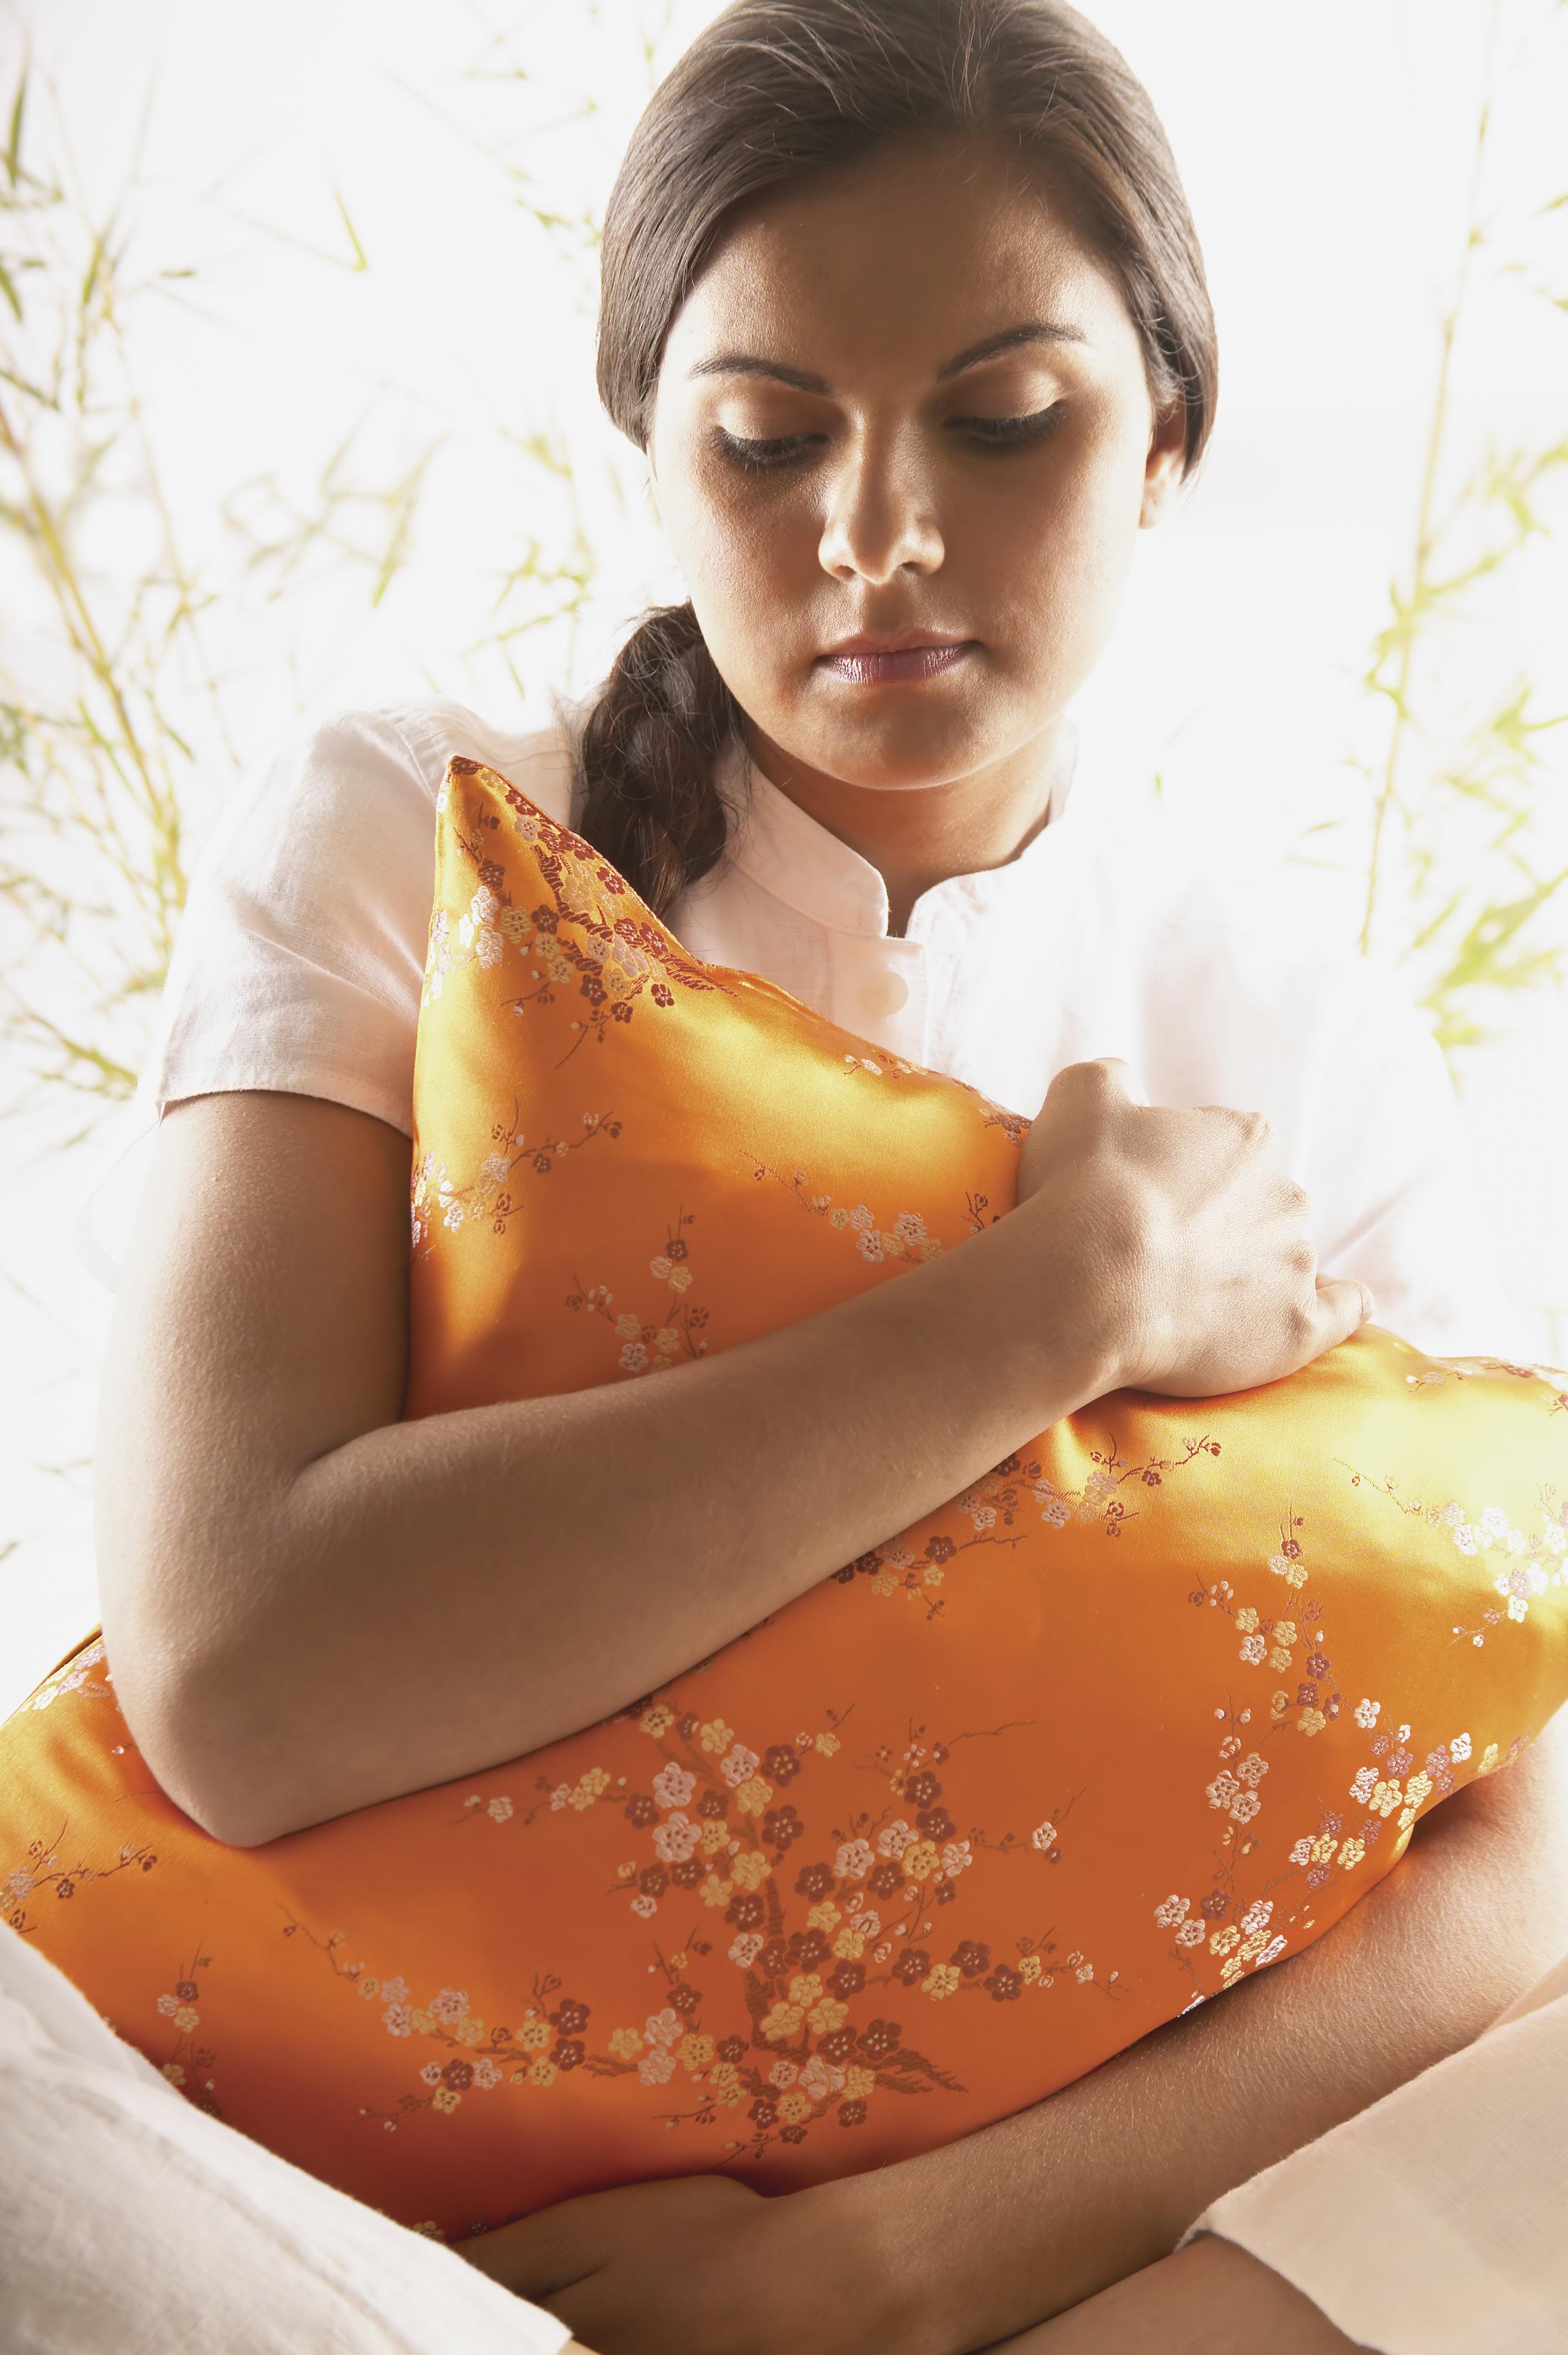 Woman hugging cushion